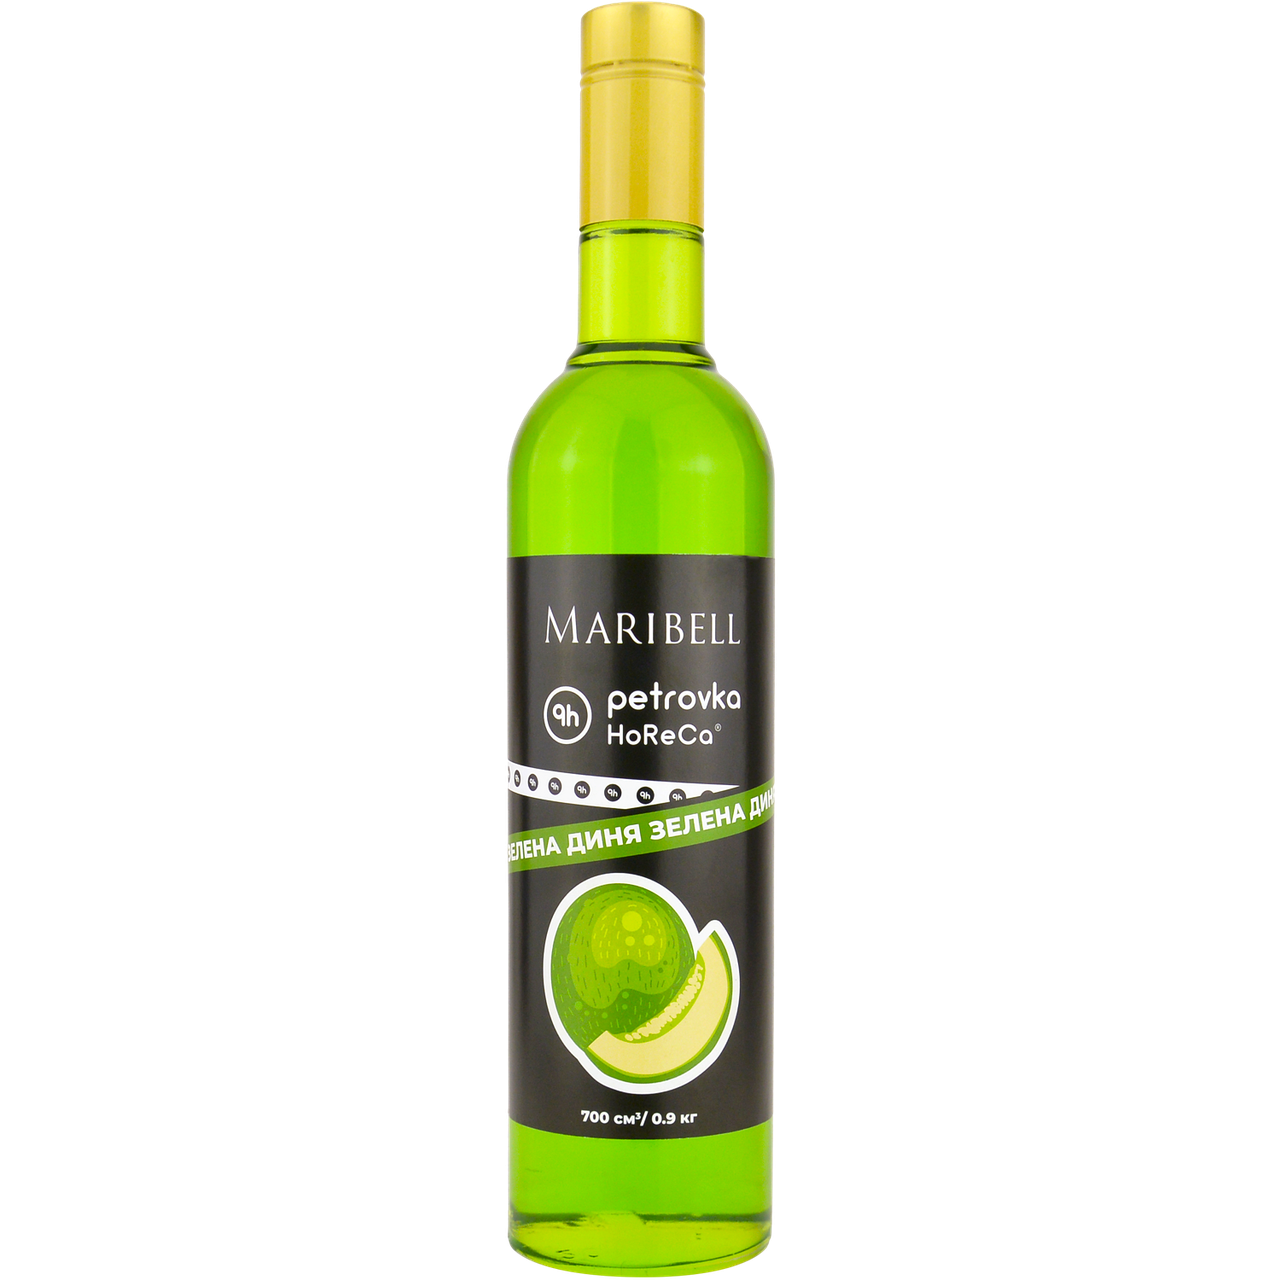 Сироп коктейльный 'Зеленая дыня' Maribell-Petrovka Horeca 700мл